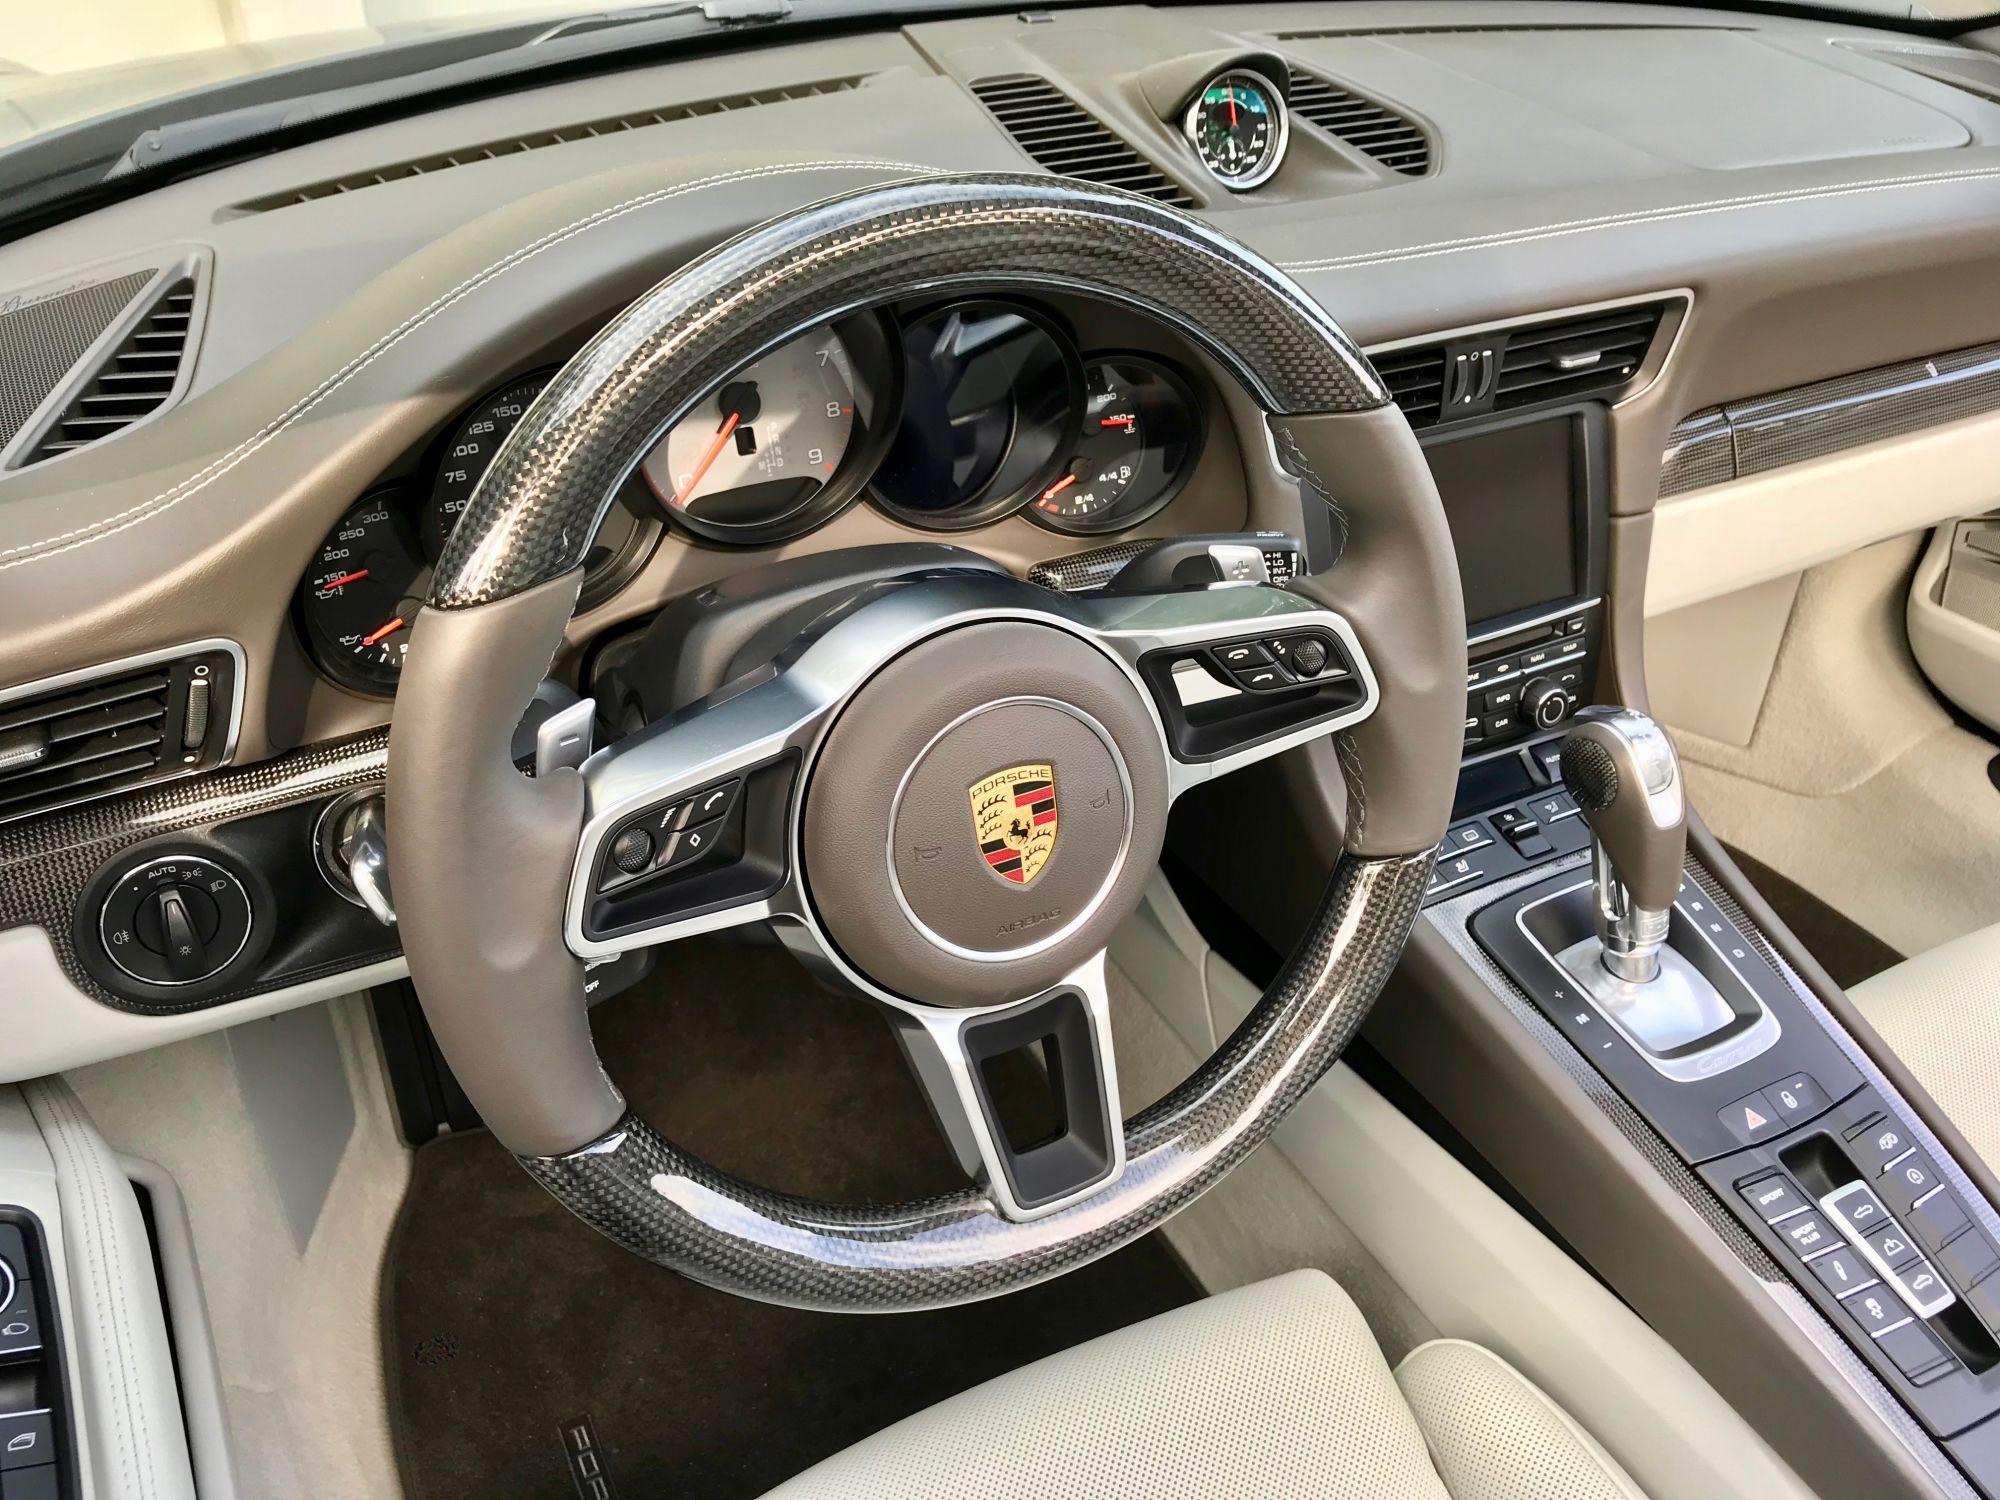 Porsche steering wheel-after-02